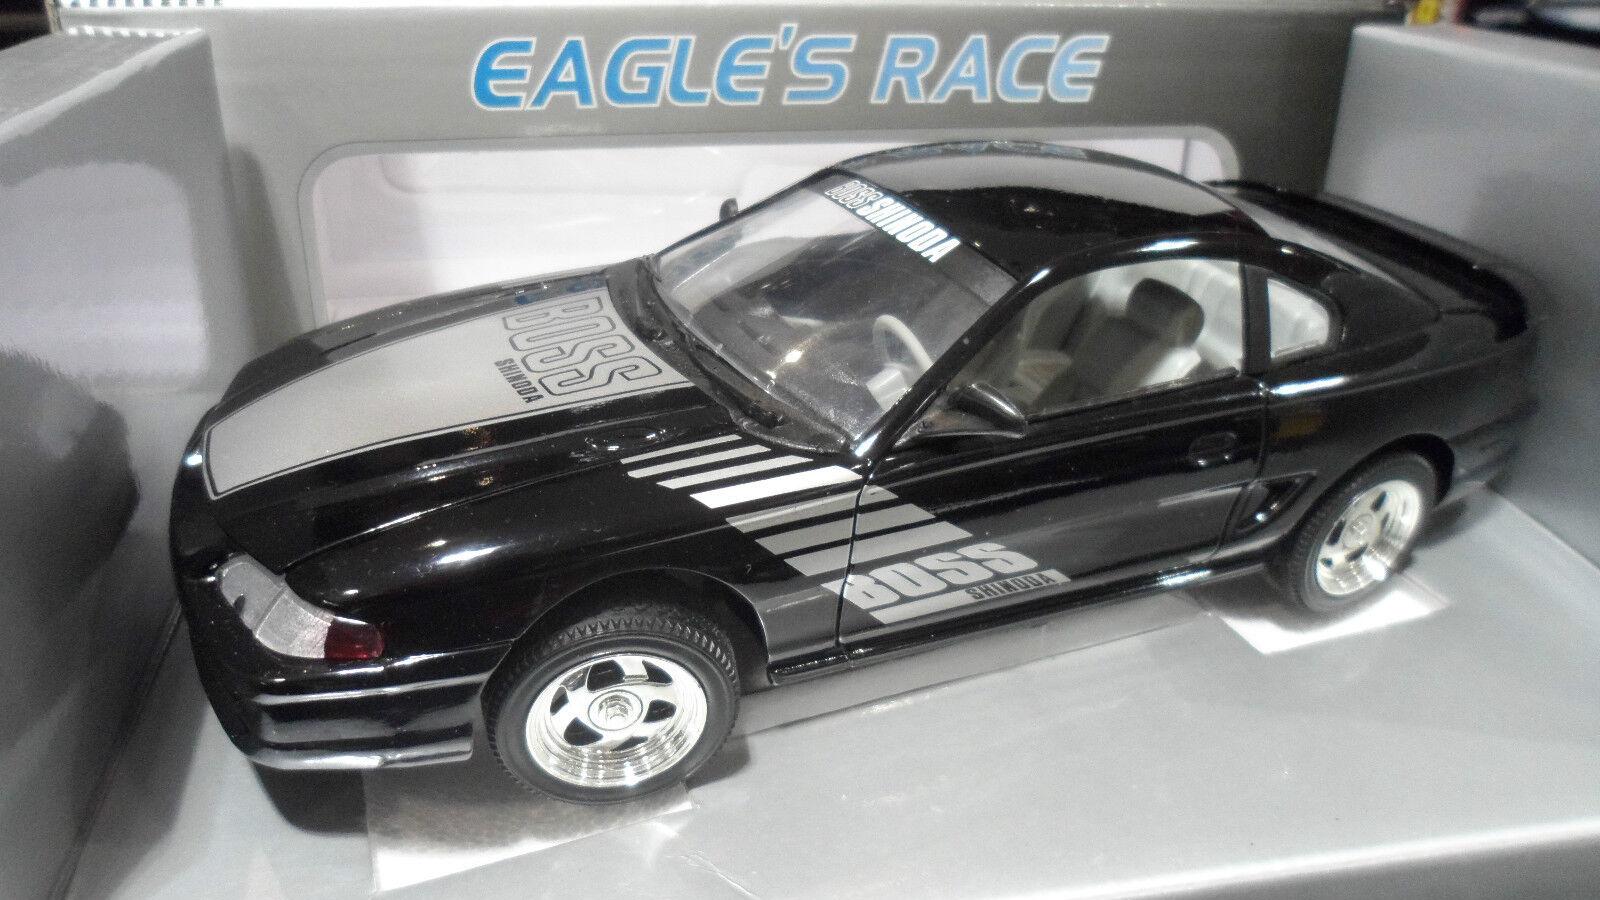 FORD MUSTANG SHINODA BOSS Coupé nero au 1 18 UNIVERSAL UNIVERSAL UNIVERSAL HOBBIES voiture miniature b32652